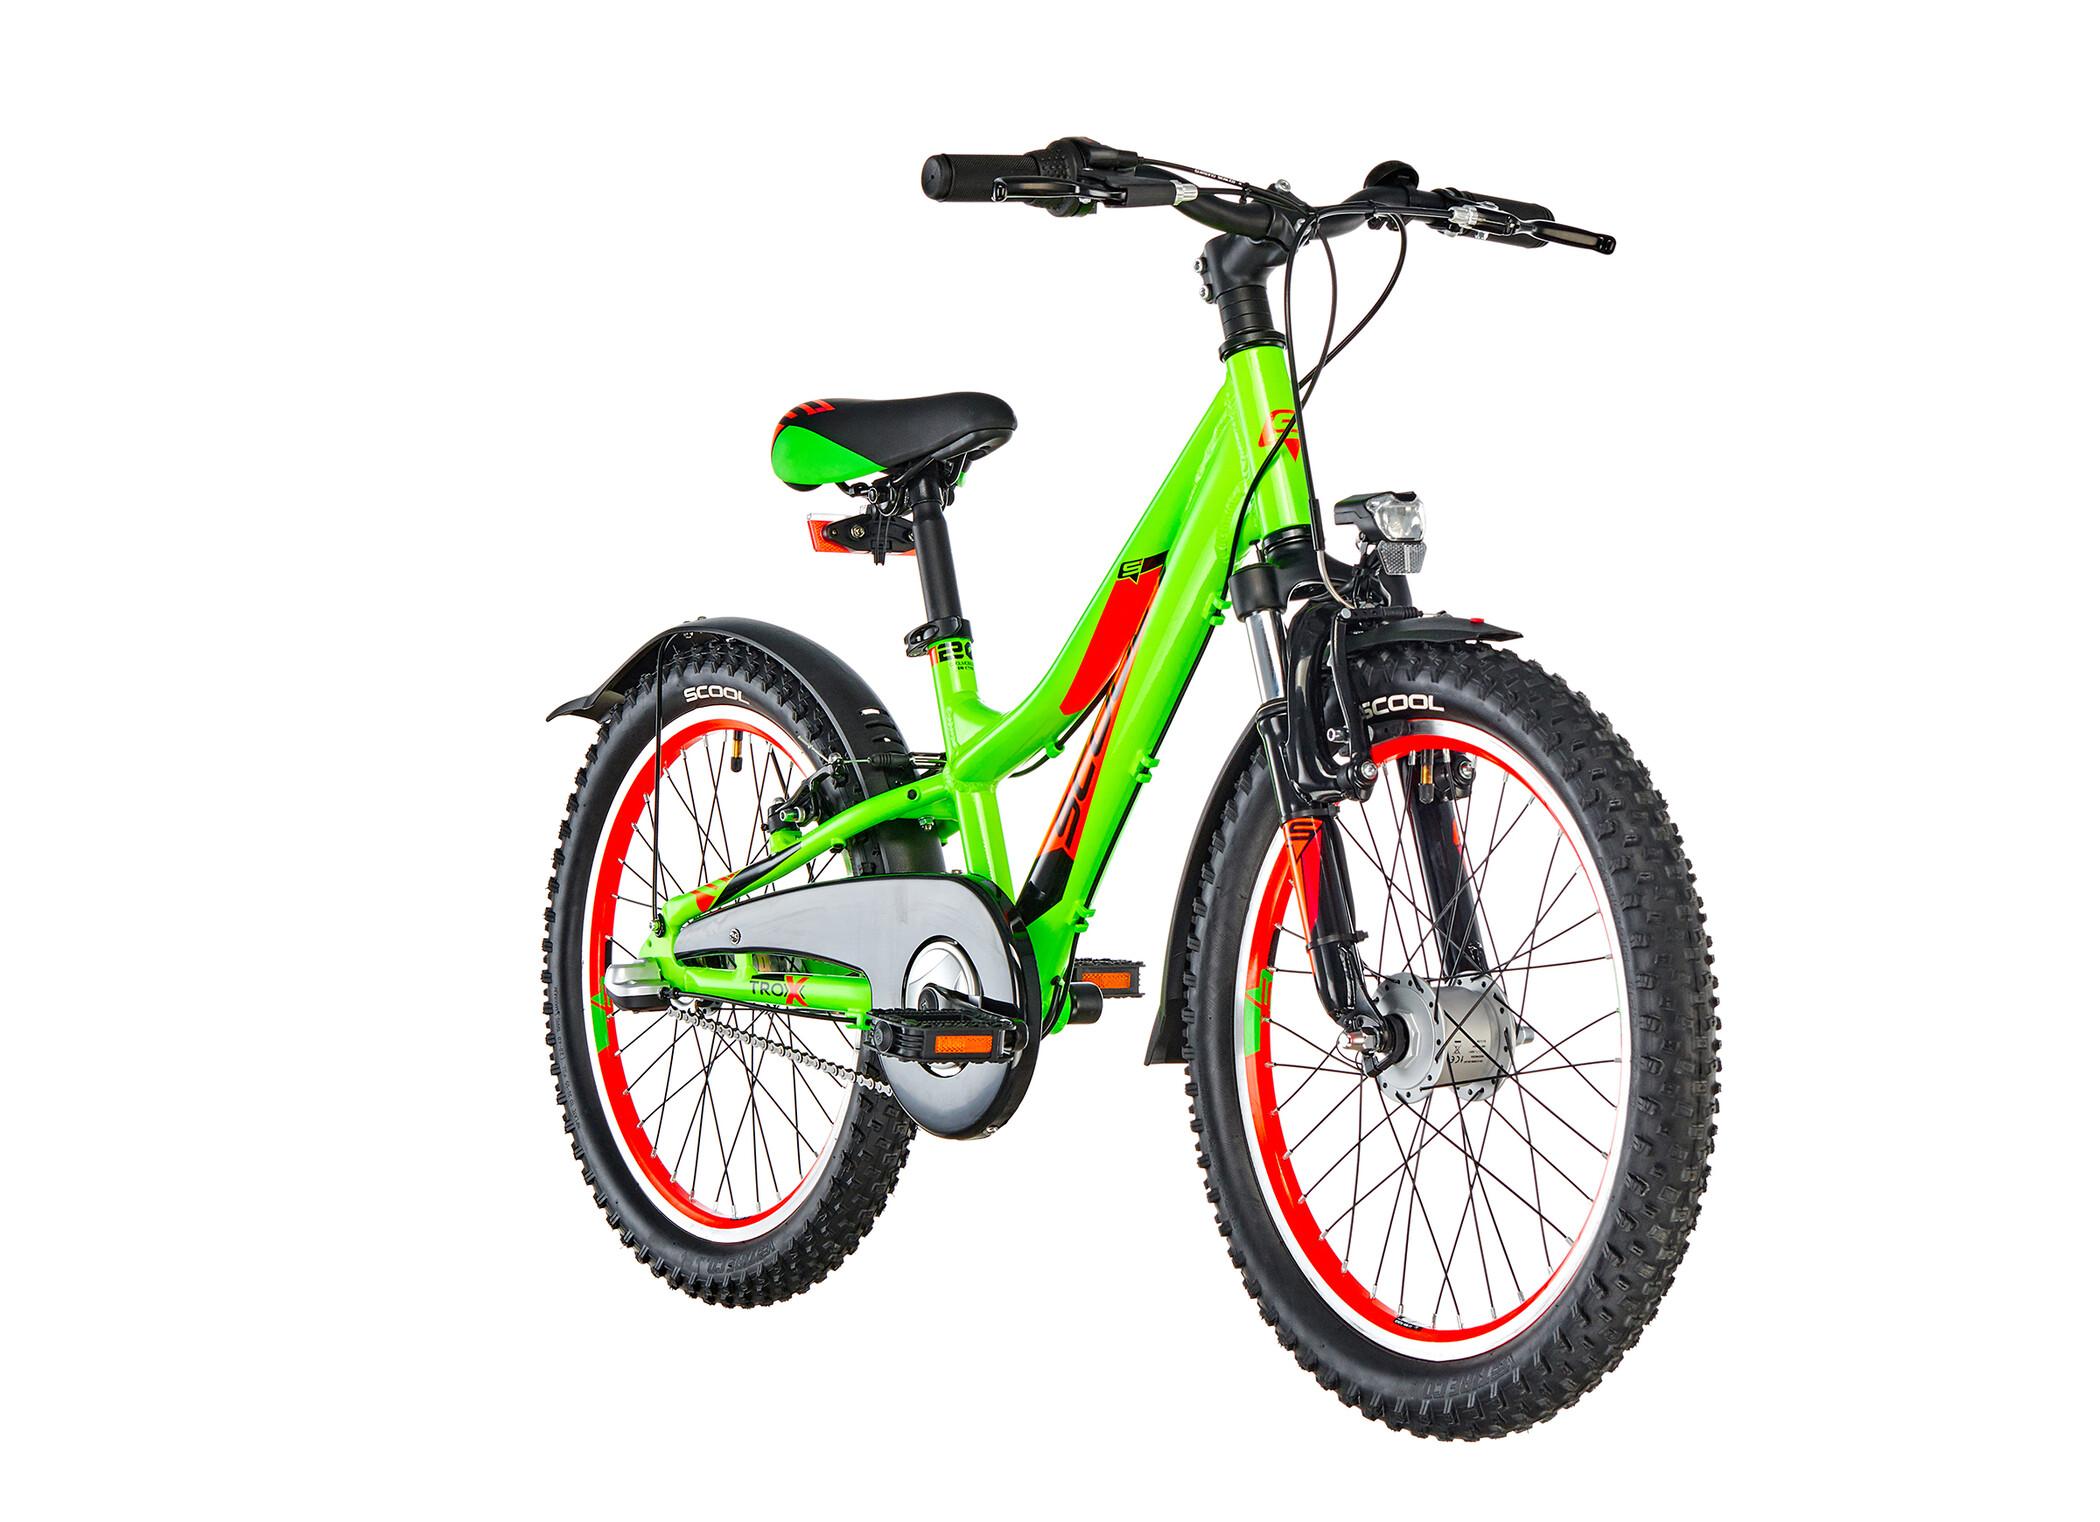 s'cool troX urban 20 3-S alloy Kids, neon green (2019) | City